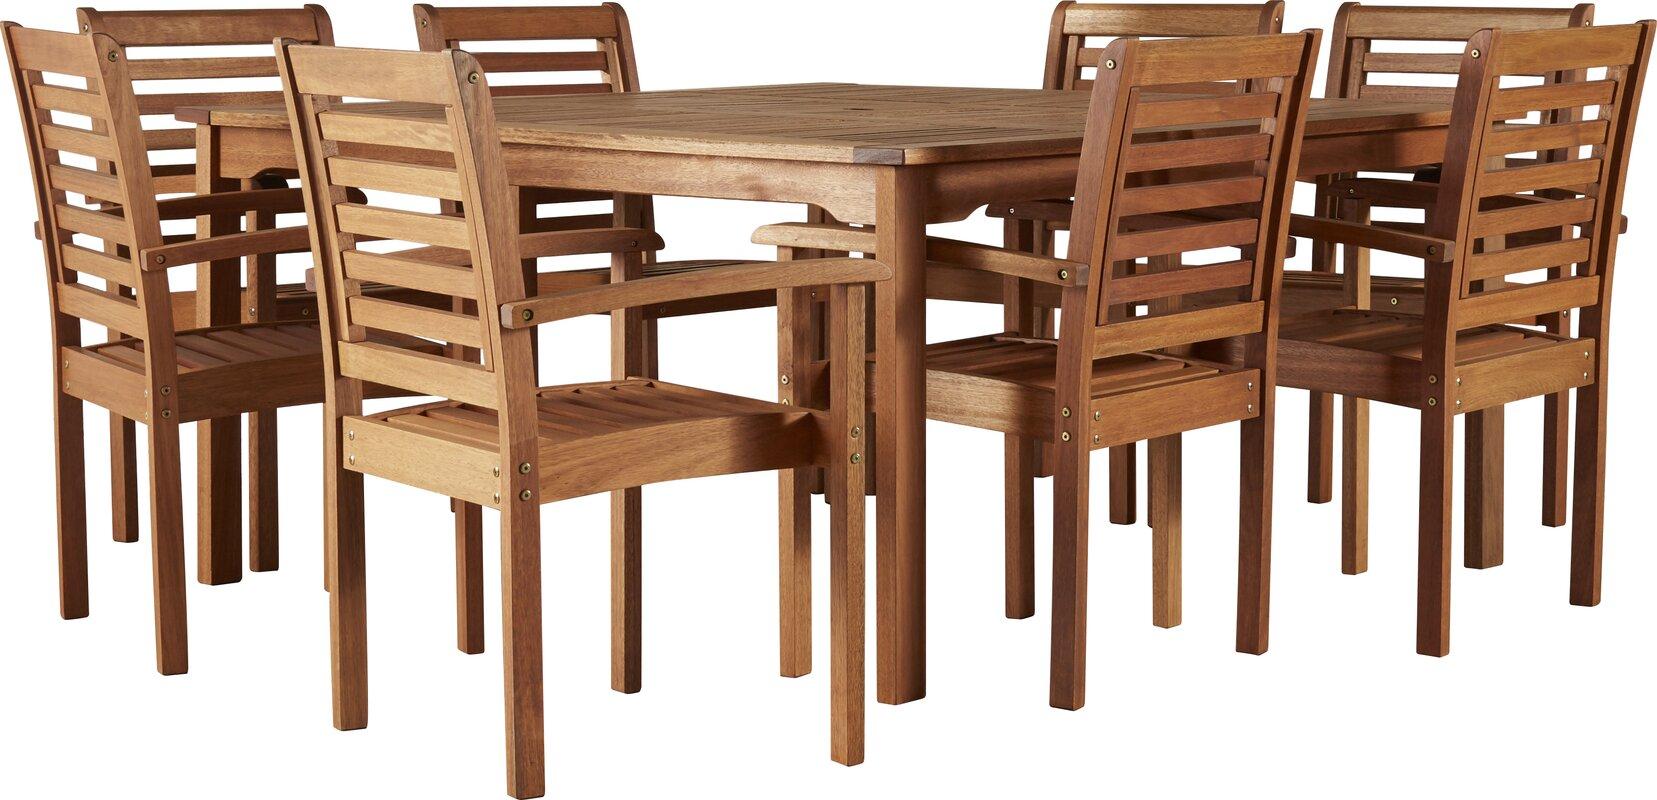 Elsmere 9 Piece Dining Set  sc 1 st  Joss \u0026 Main & Elsmere 9 Piece Dining Set \u0026 Reviews | Joss \u0026 Main